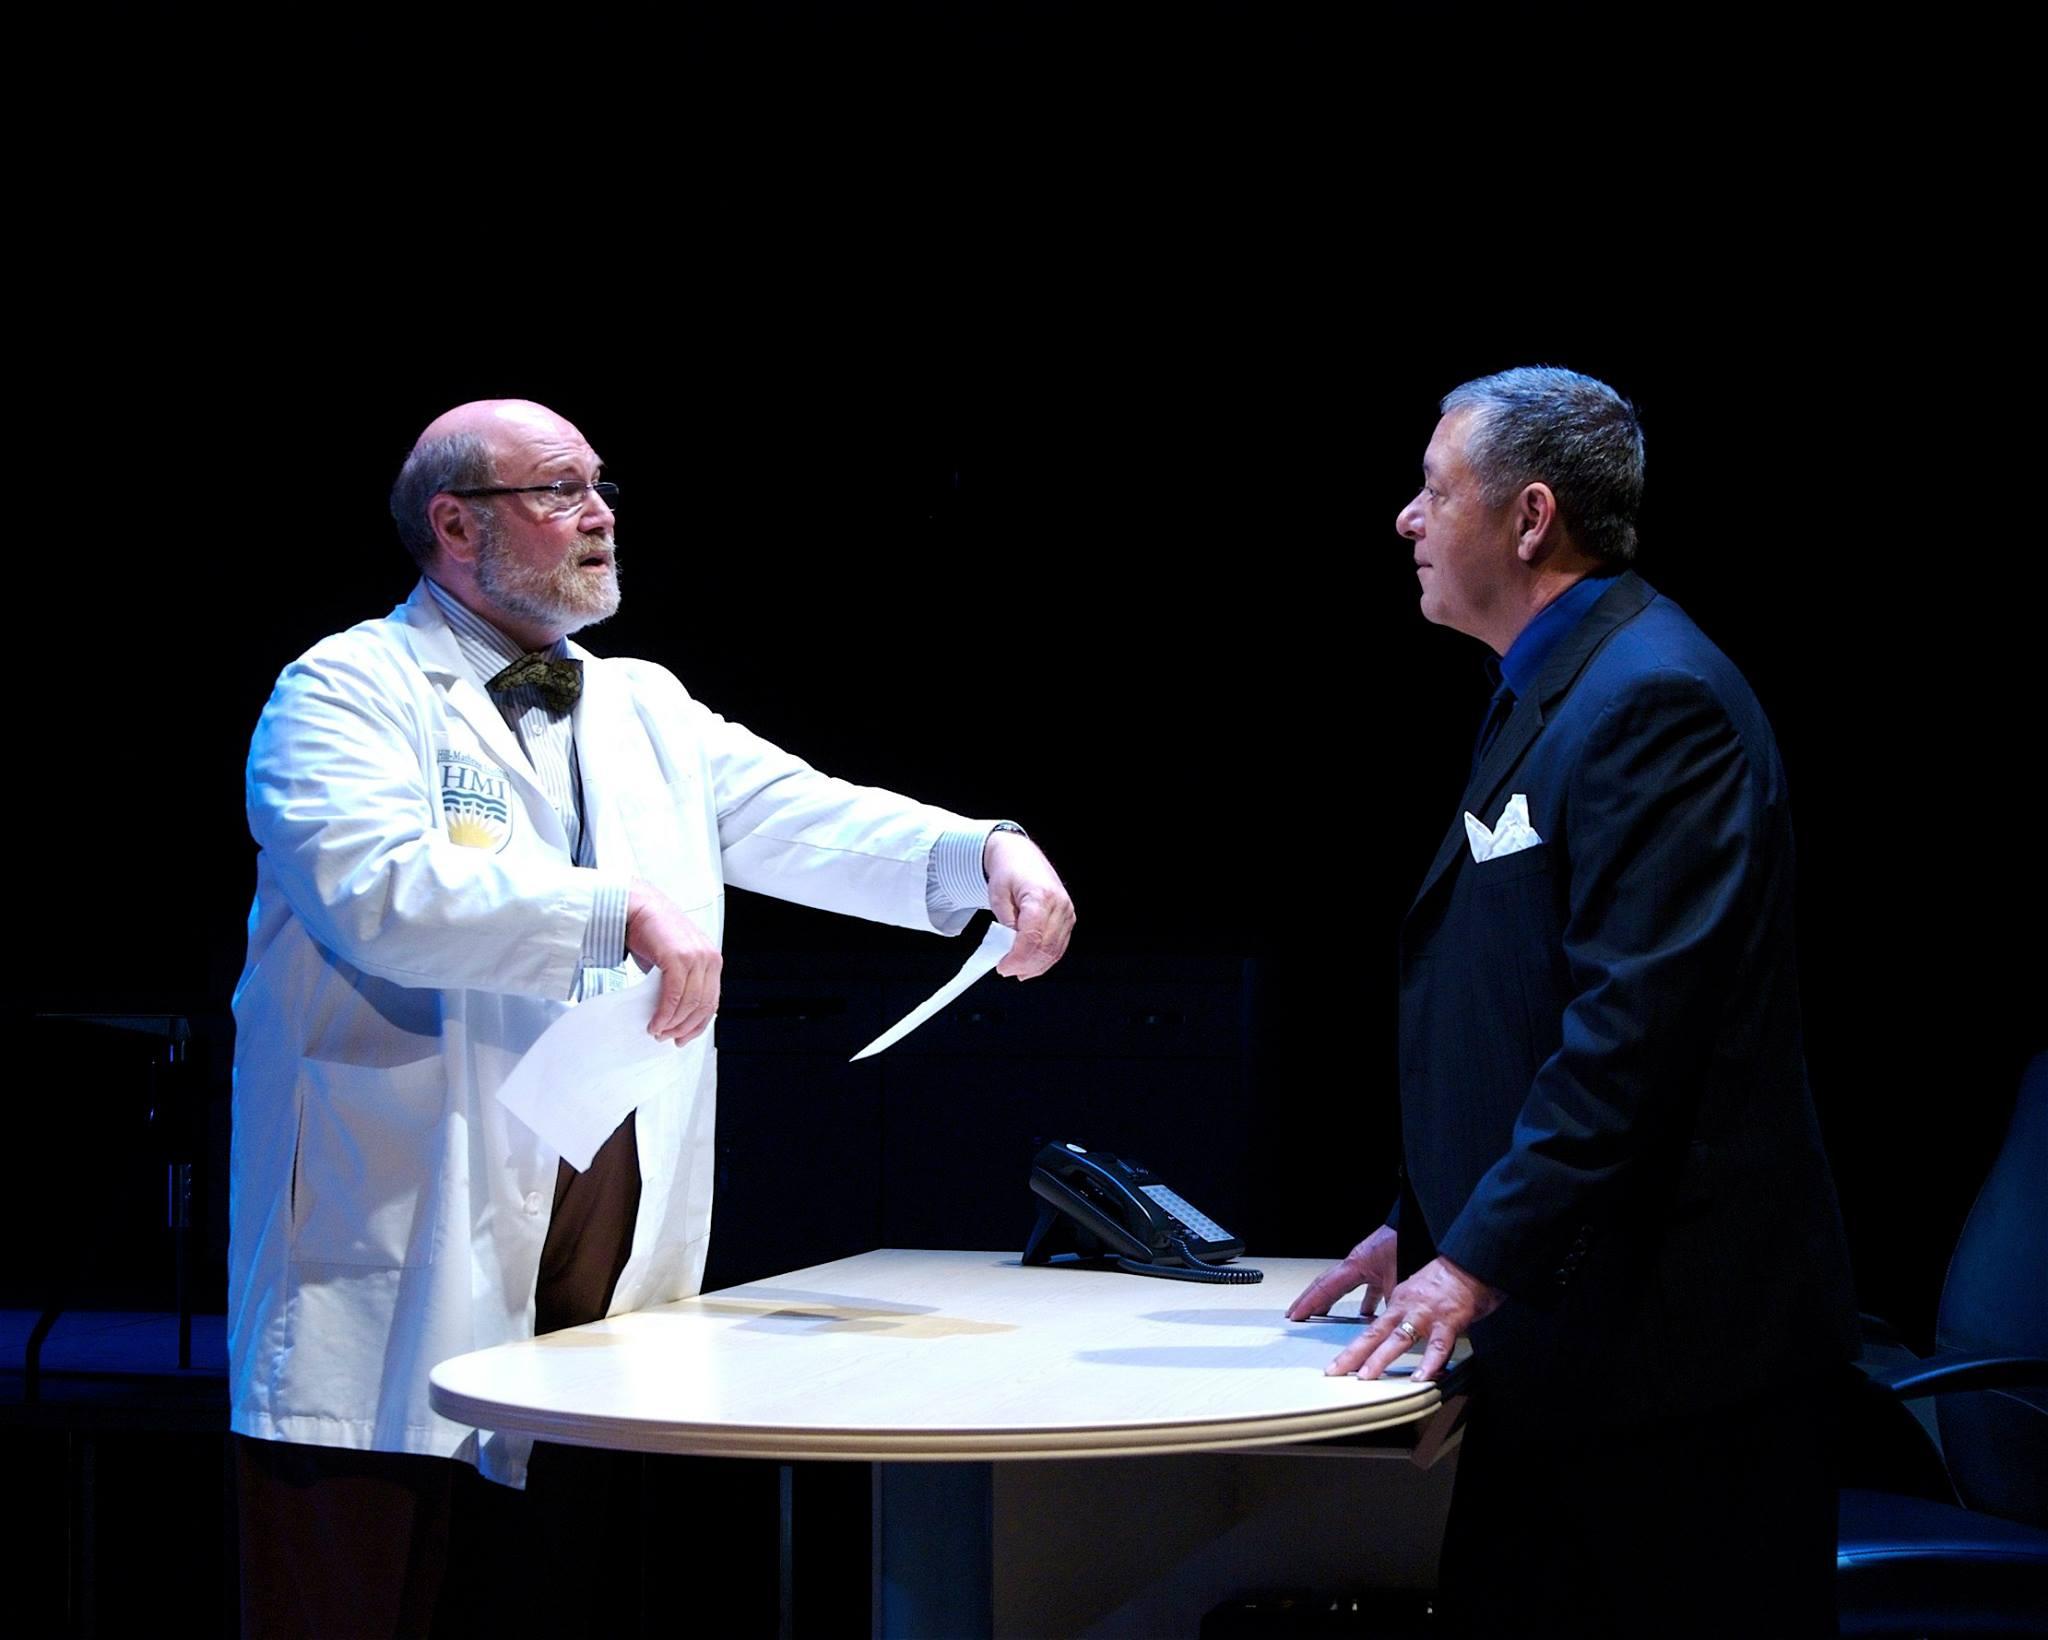 Actors Theatre. 2010. Secret Order. David Vining, Mark DeMichele. Photo by John Groseclose.